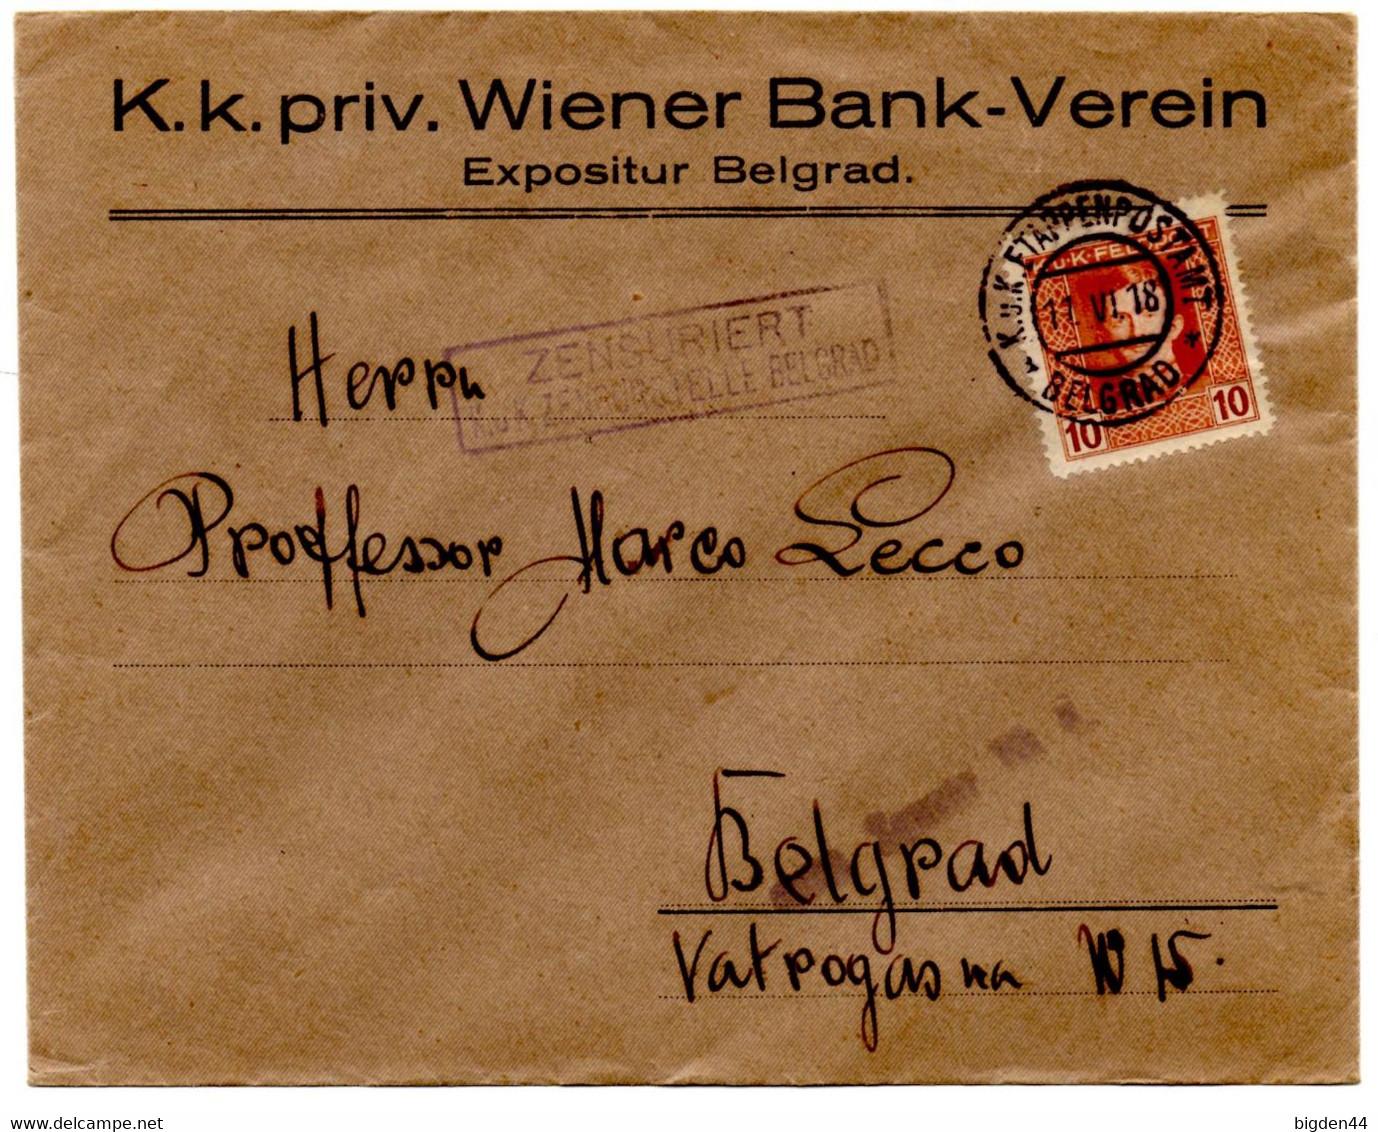 Lettre De Beograd Belgrade  (11.6.1918) Censure Etappenpostamt Occupation Autrichienne Serbie Zensuriert - Sin Clasificación